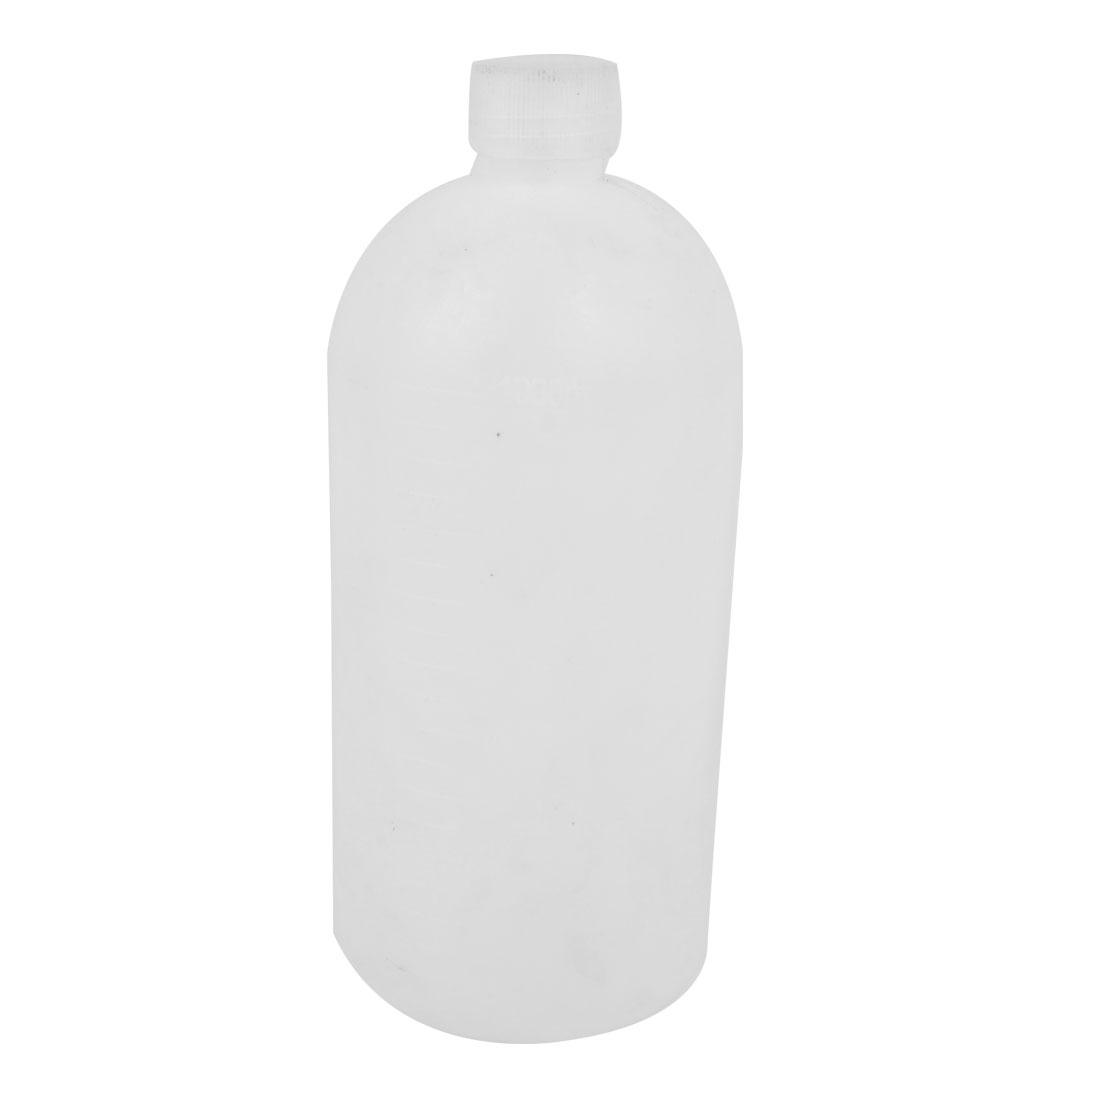 White Plastic 1000mL Capacity Laboratory Storage Narrow Mouth Bottle